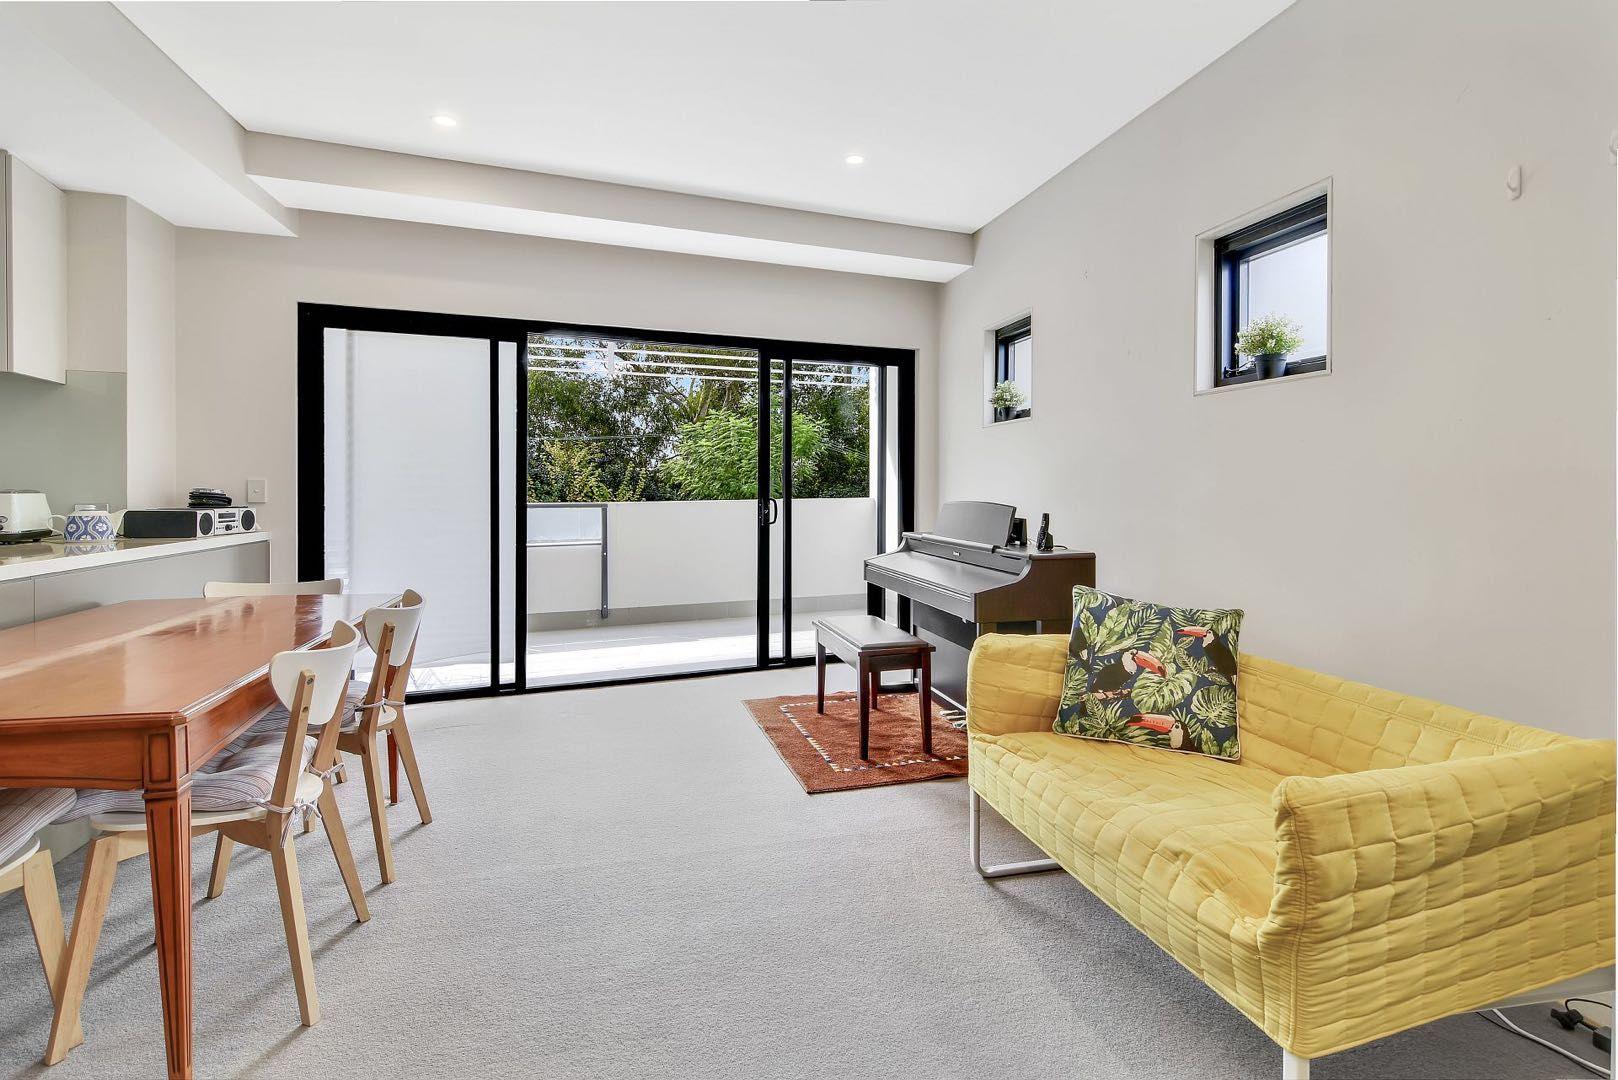 14/42-48 Culworth Ave, Killara NSW 2071, Image 0